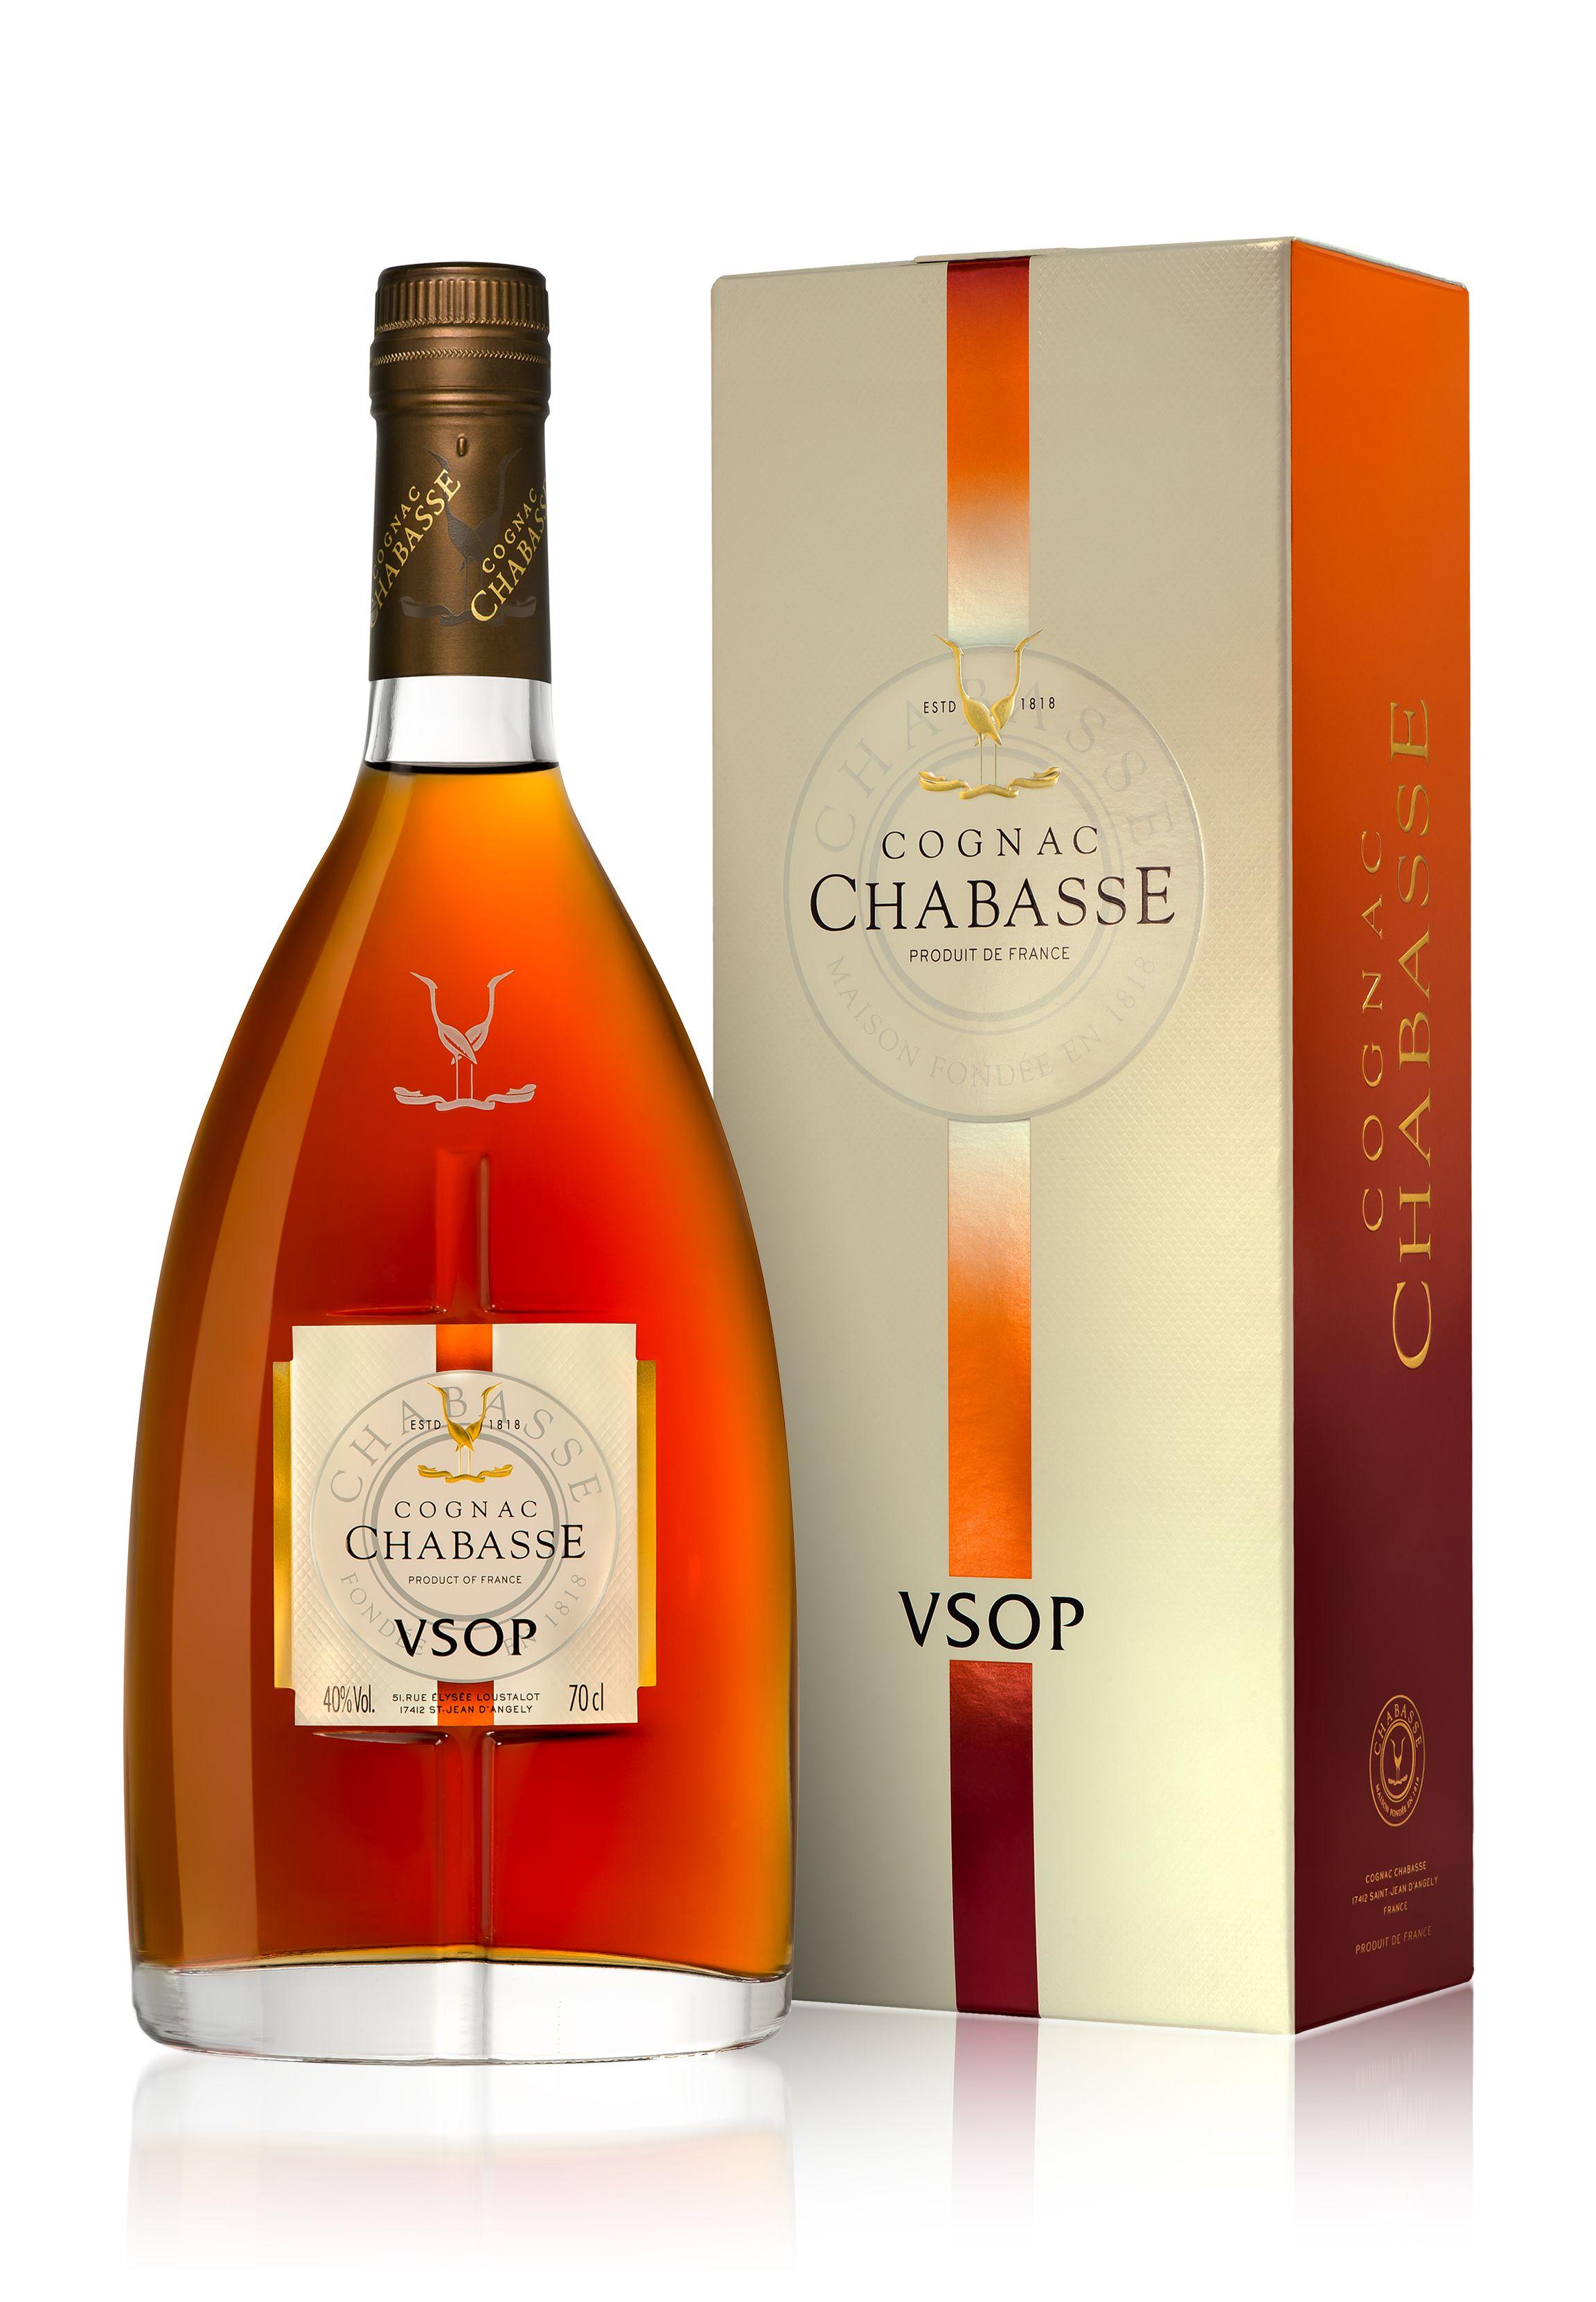 Cognac Chabasse Vsop Packaging Design By Linea Drinking Design Wine And Spirits Liquor Bottles